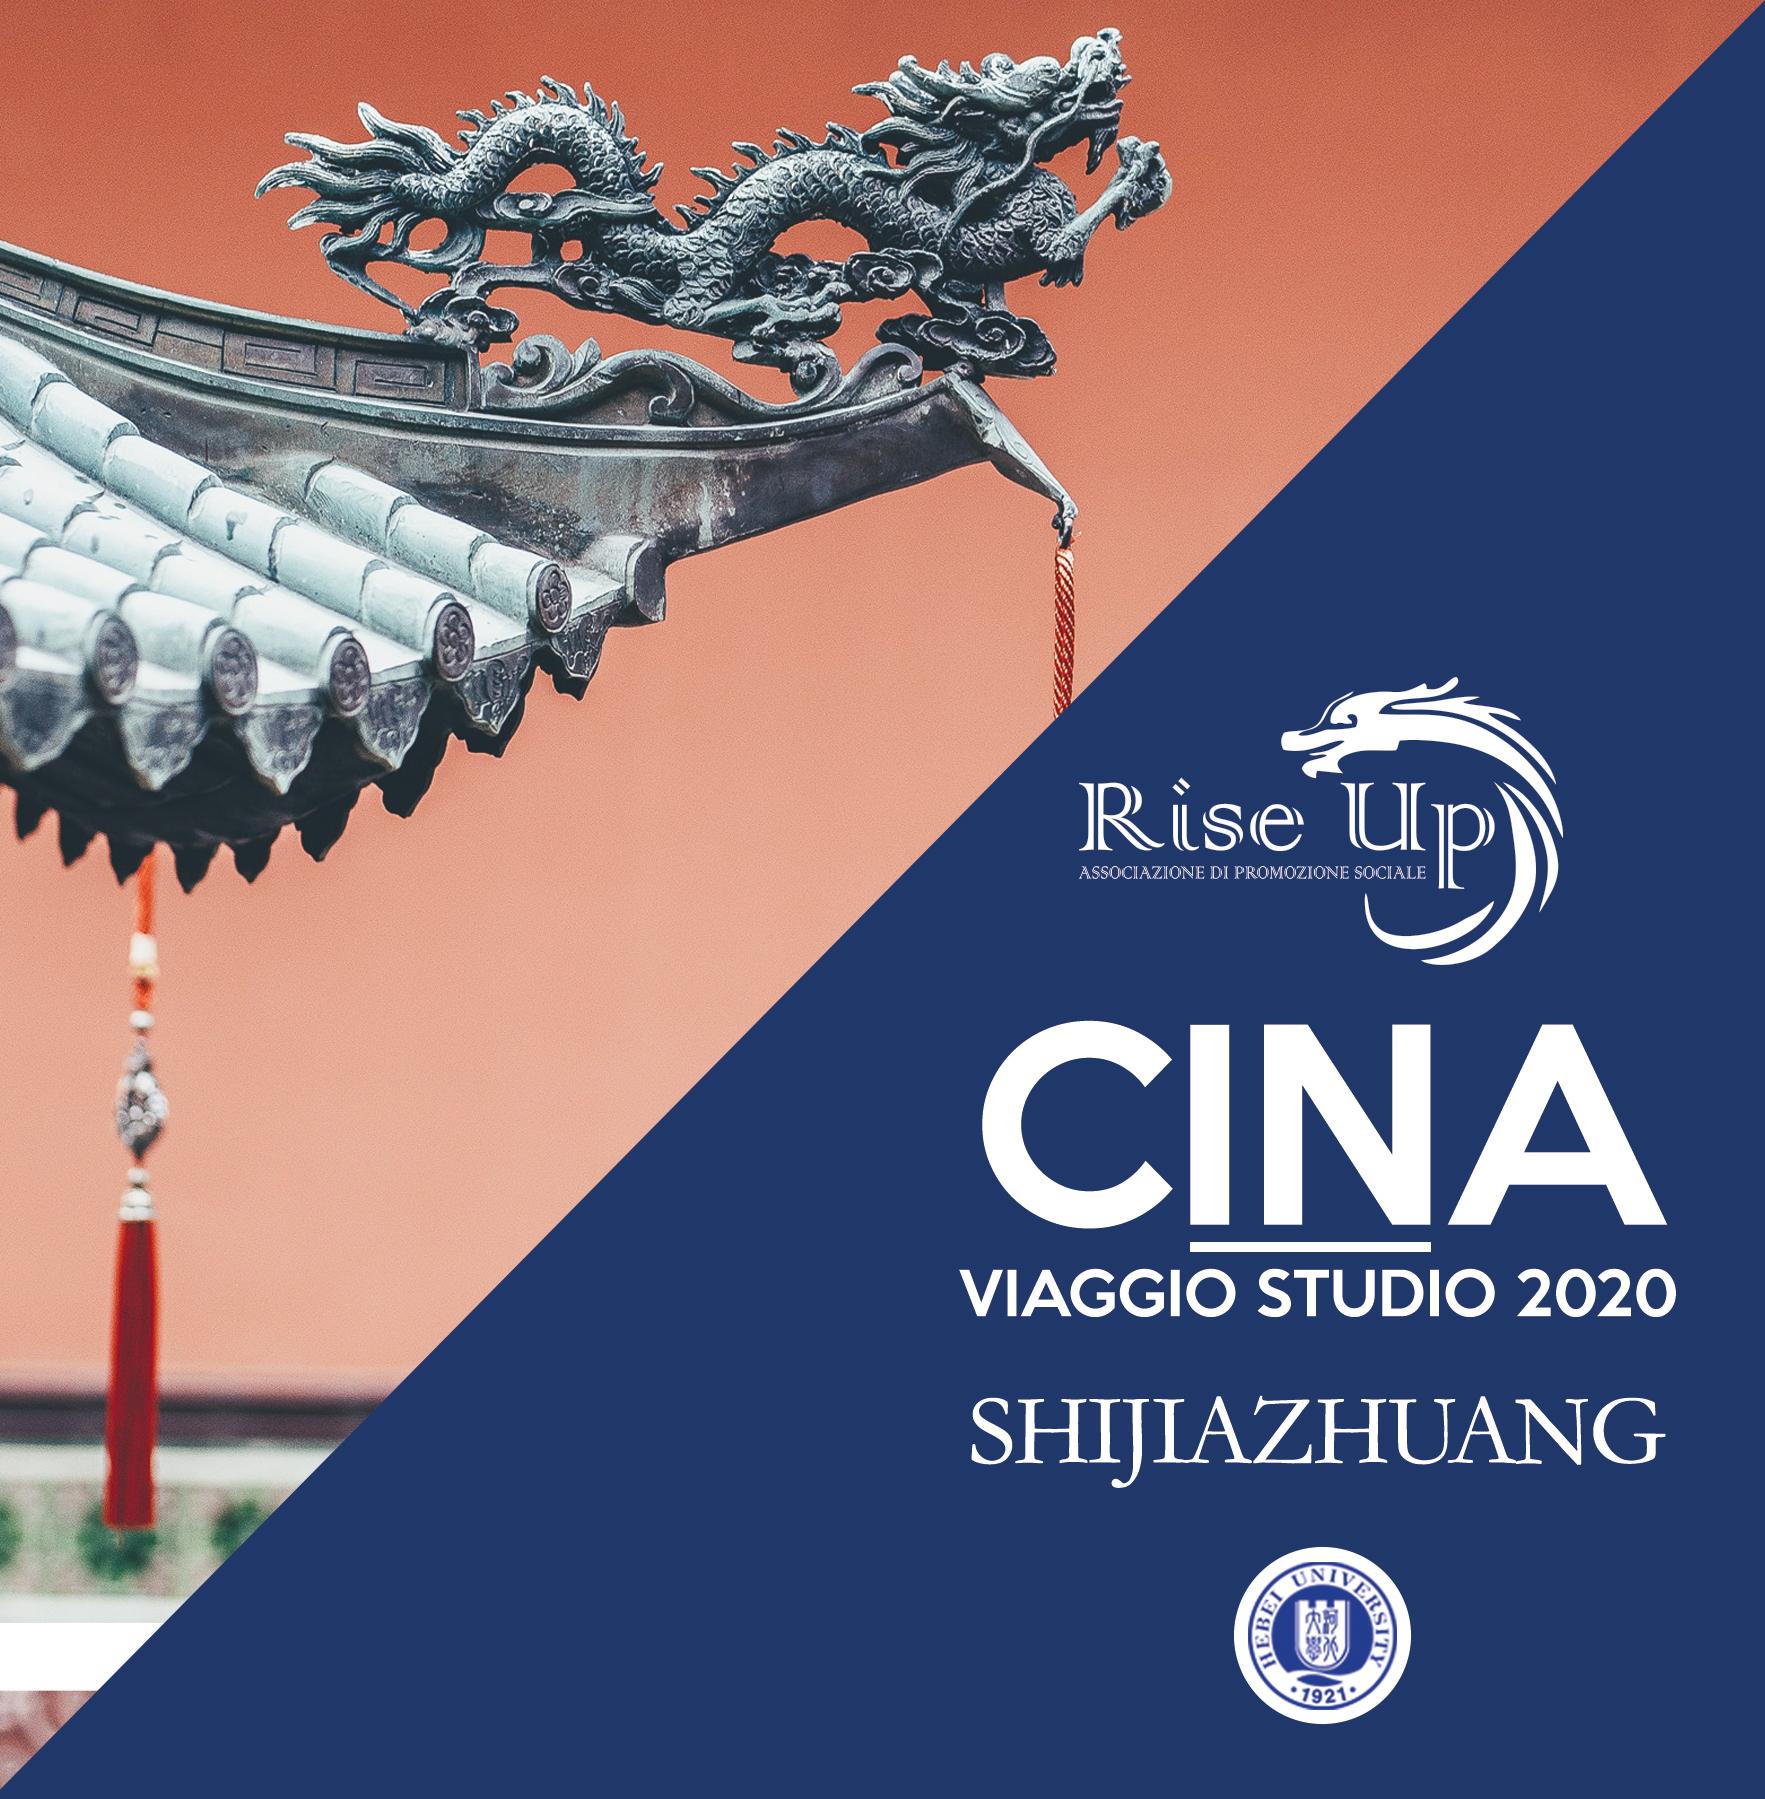 Viaggio Shijiazhuang 2020 poster